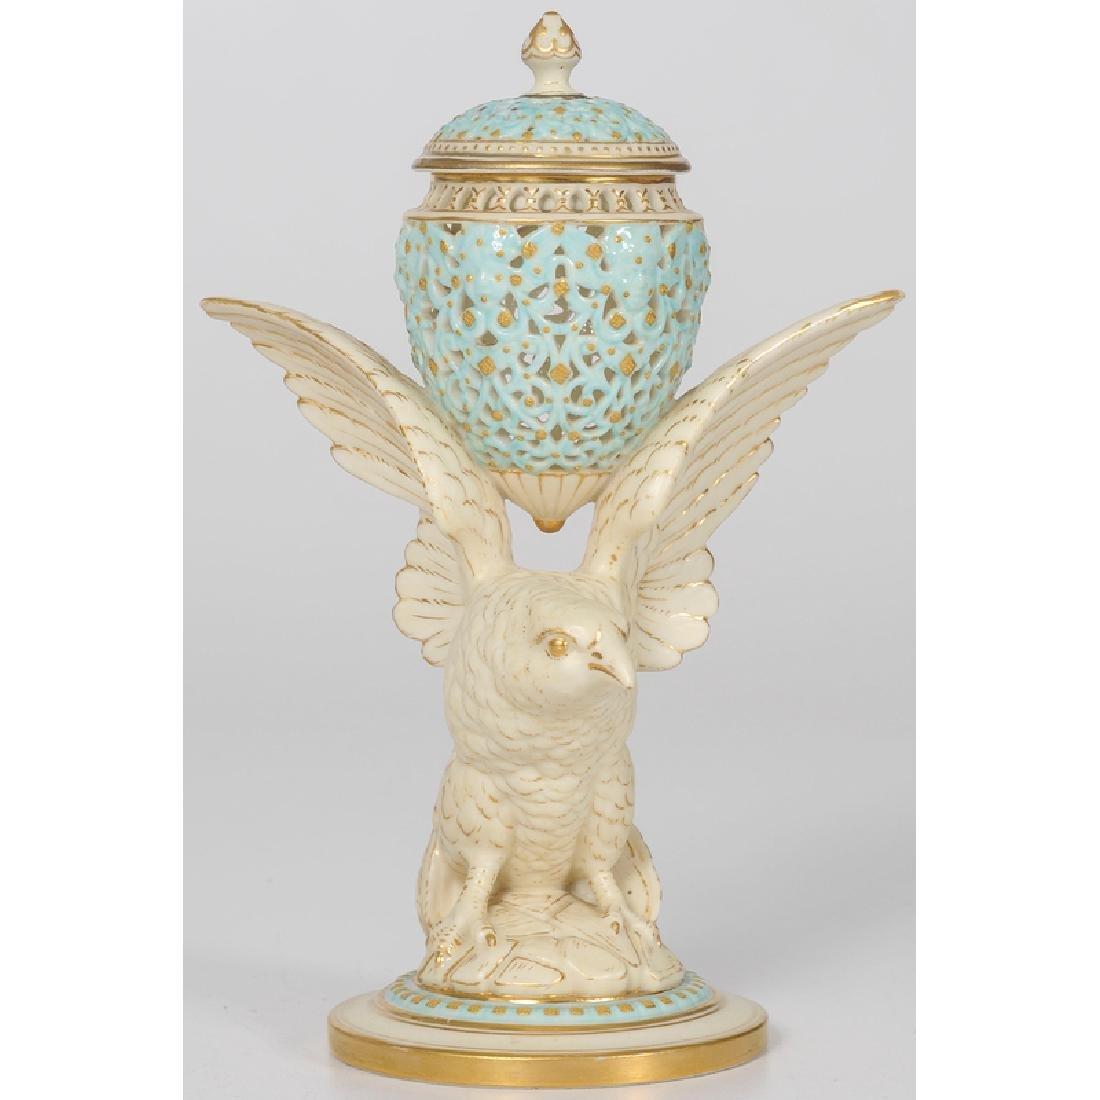 Grainger & Co. for Worcester Porcelain Potpourri